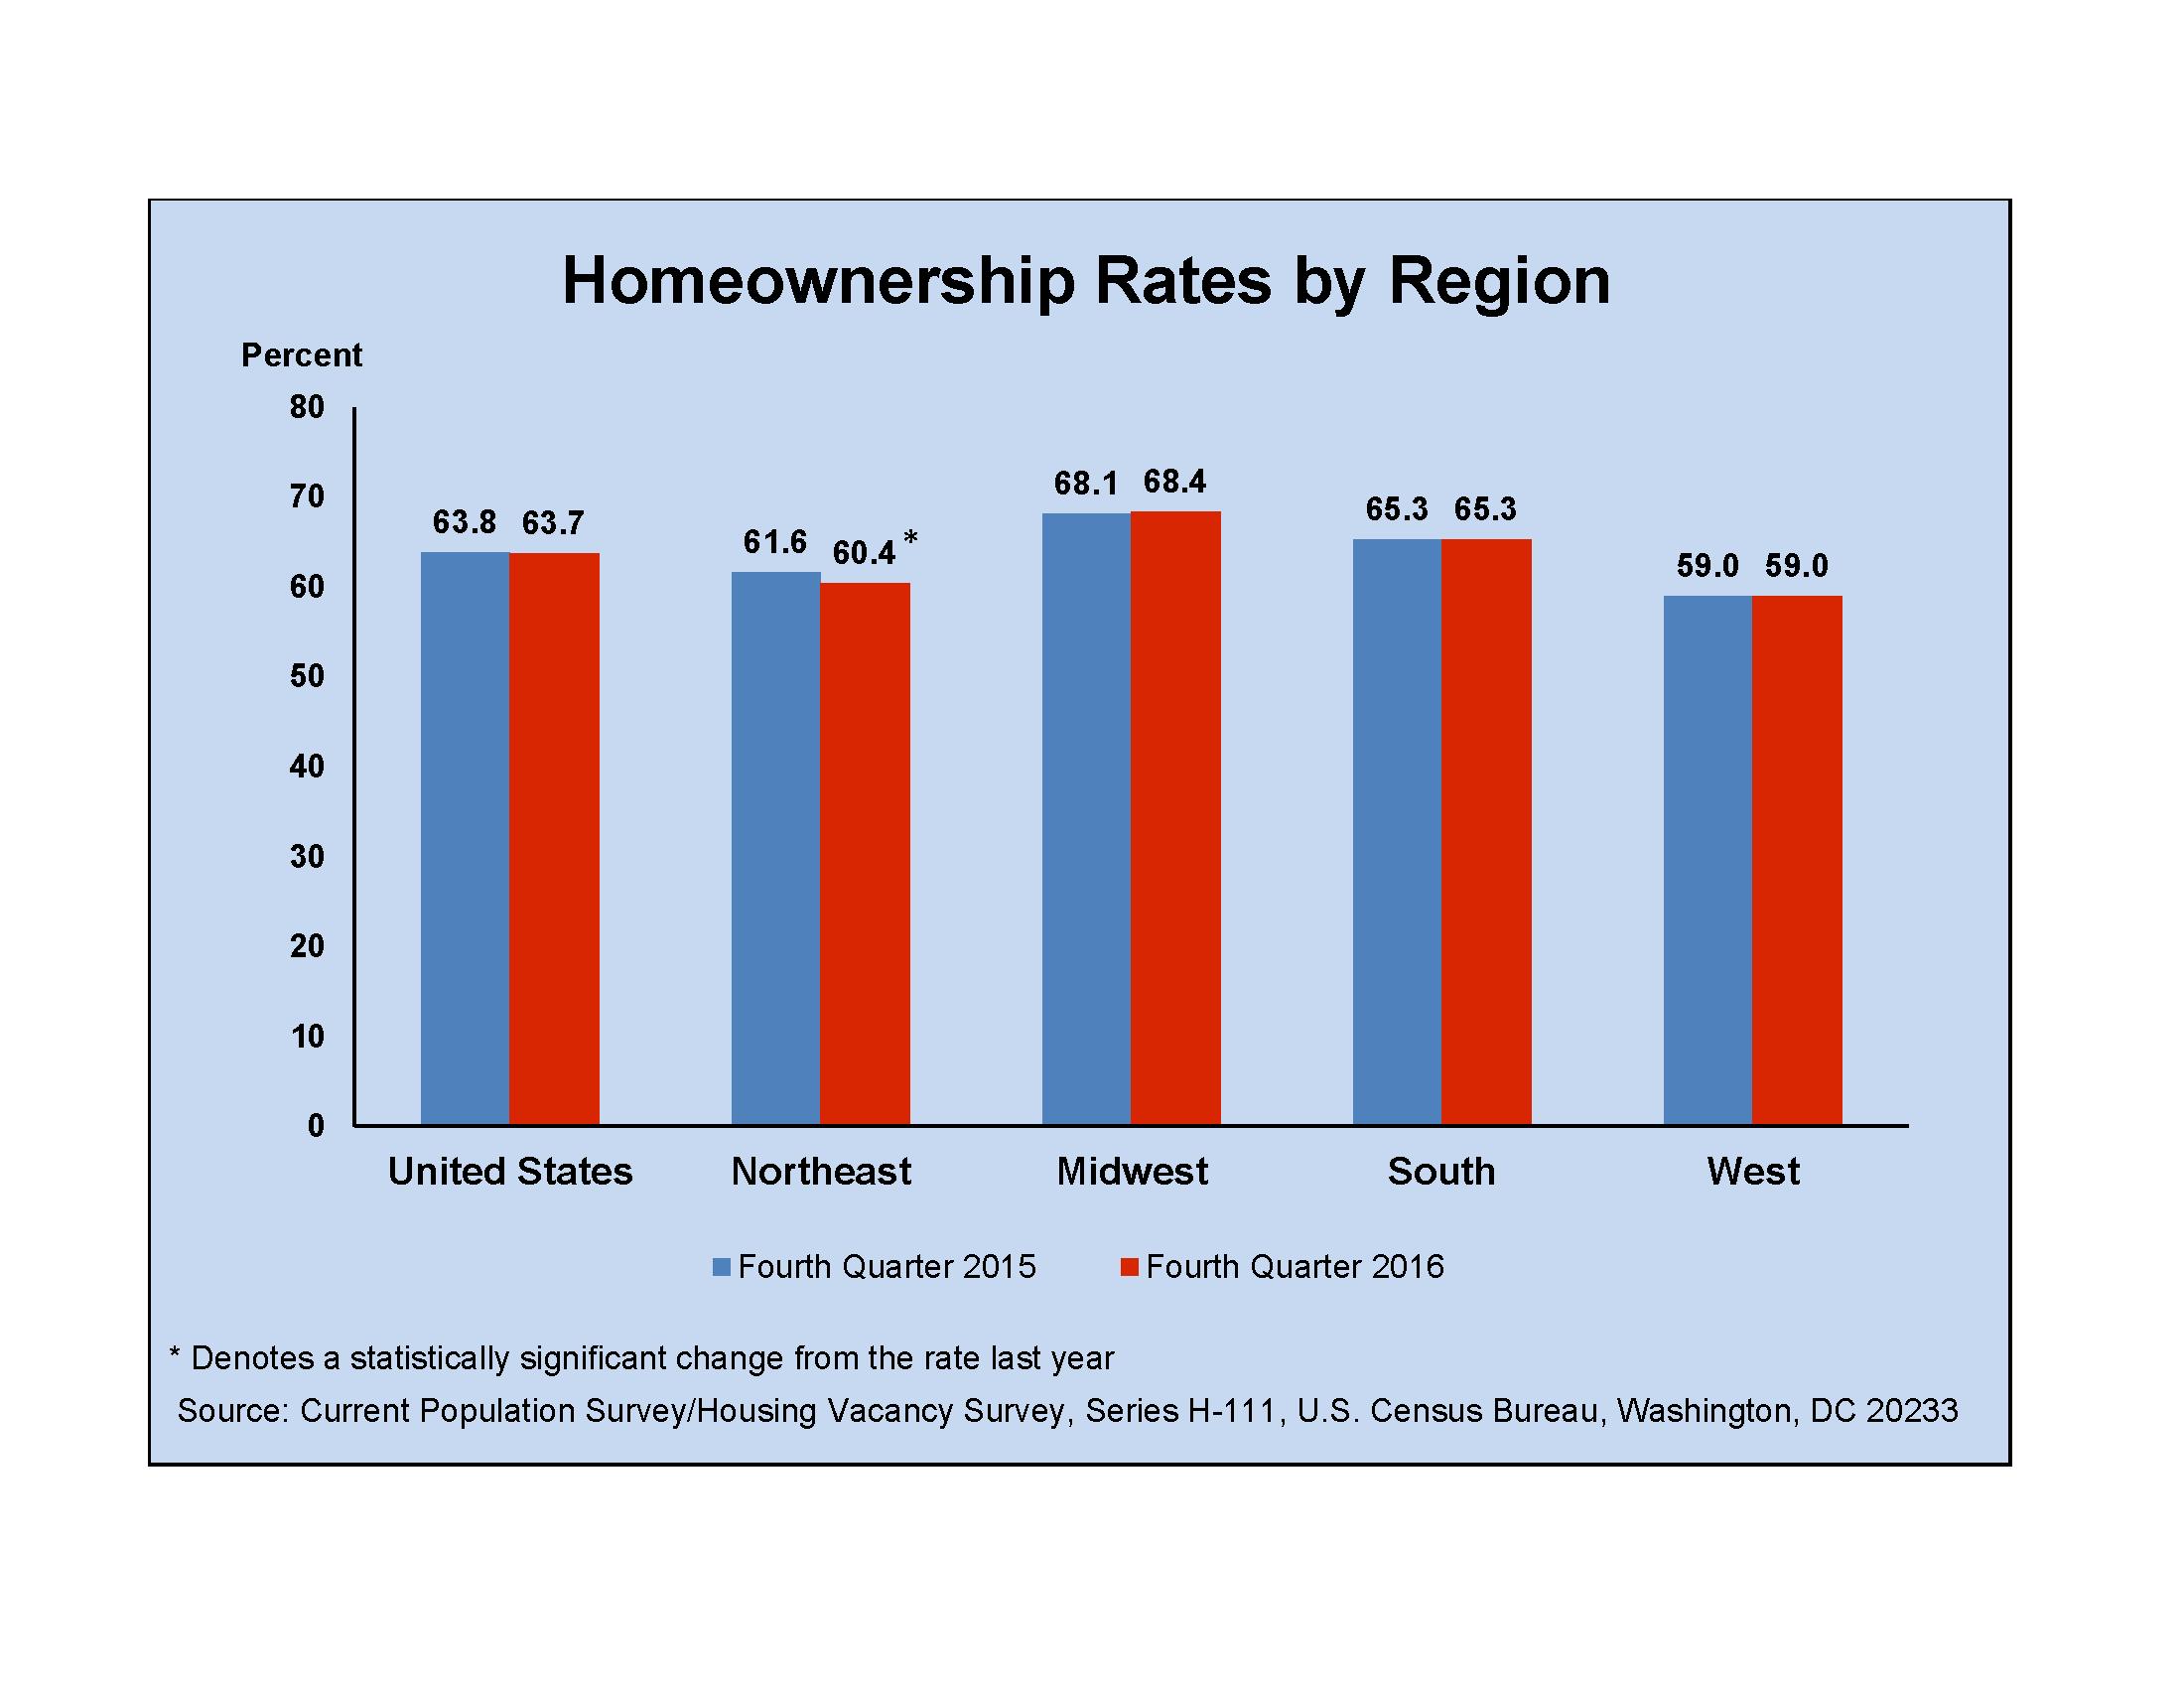 Housing Vacancies and Homeownership (CPS/HVS): 2016 - People